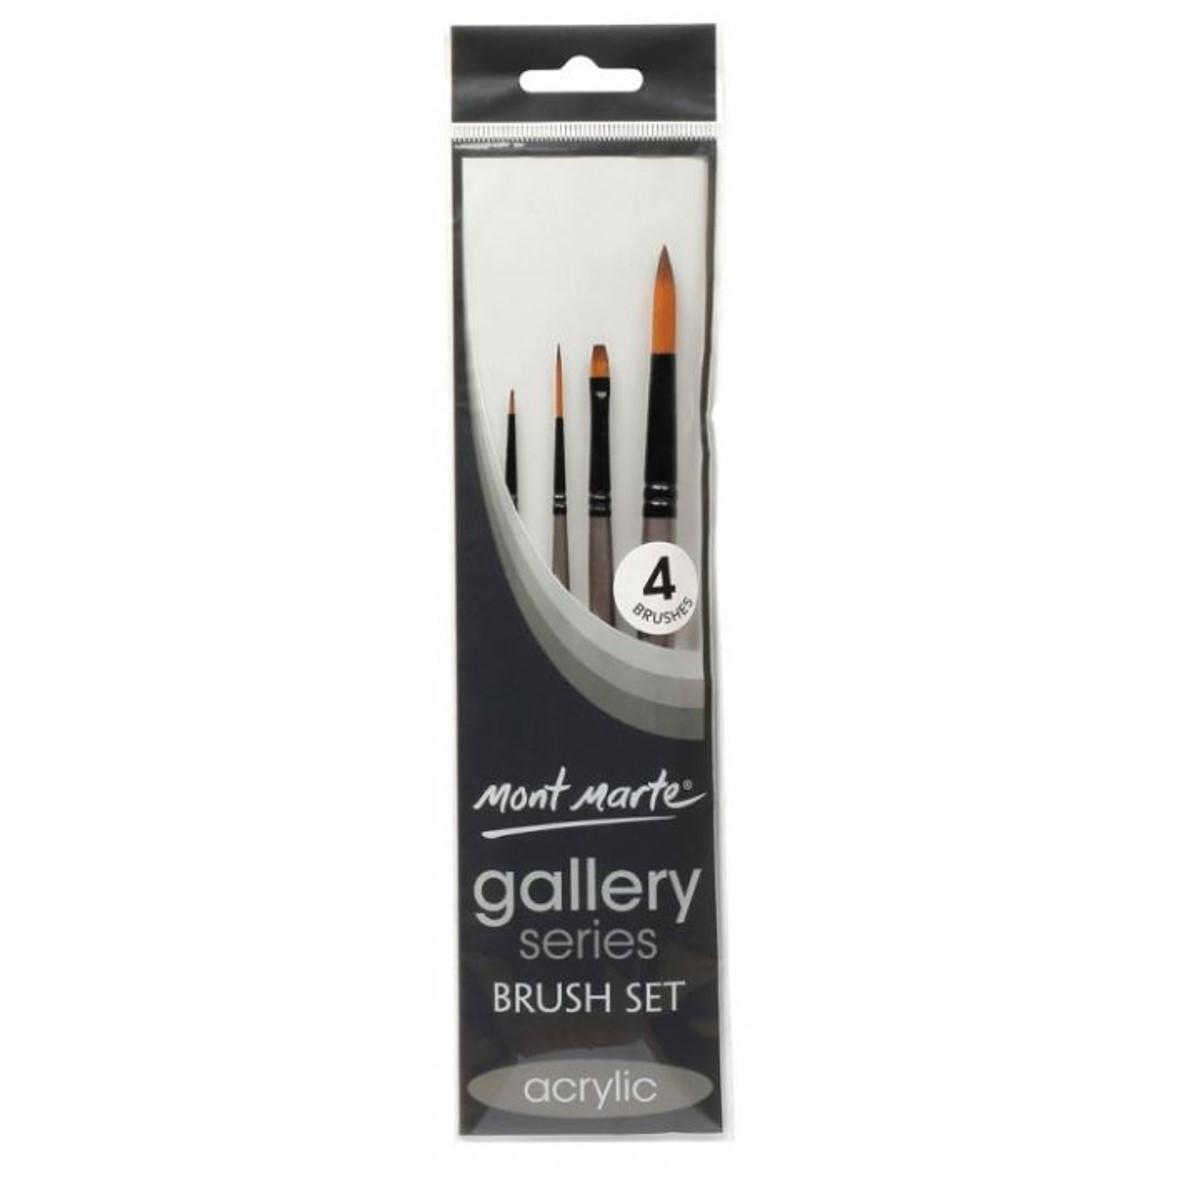 Gallery Series Acrylic Brush Set 4pce